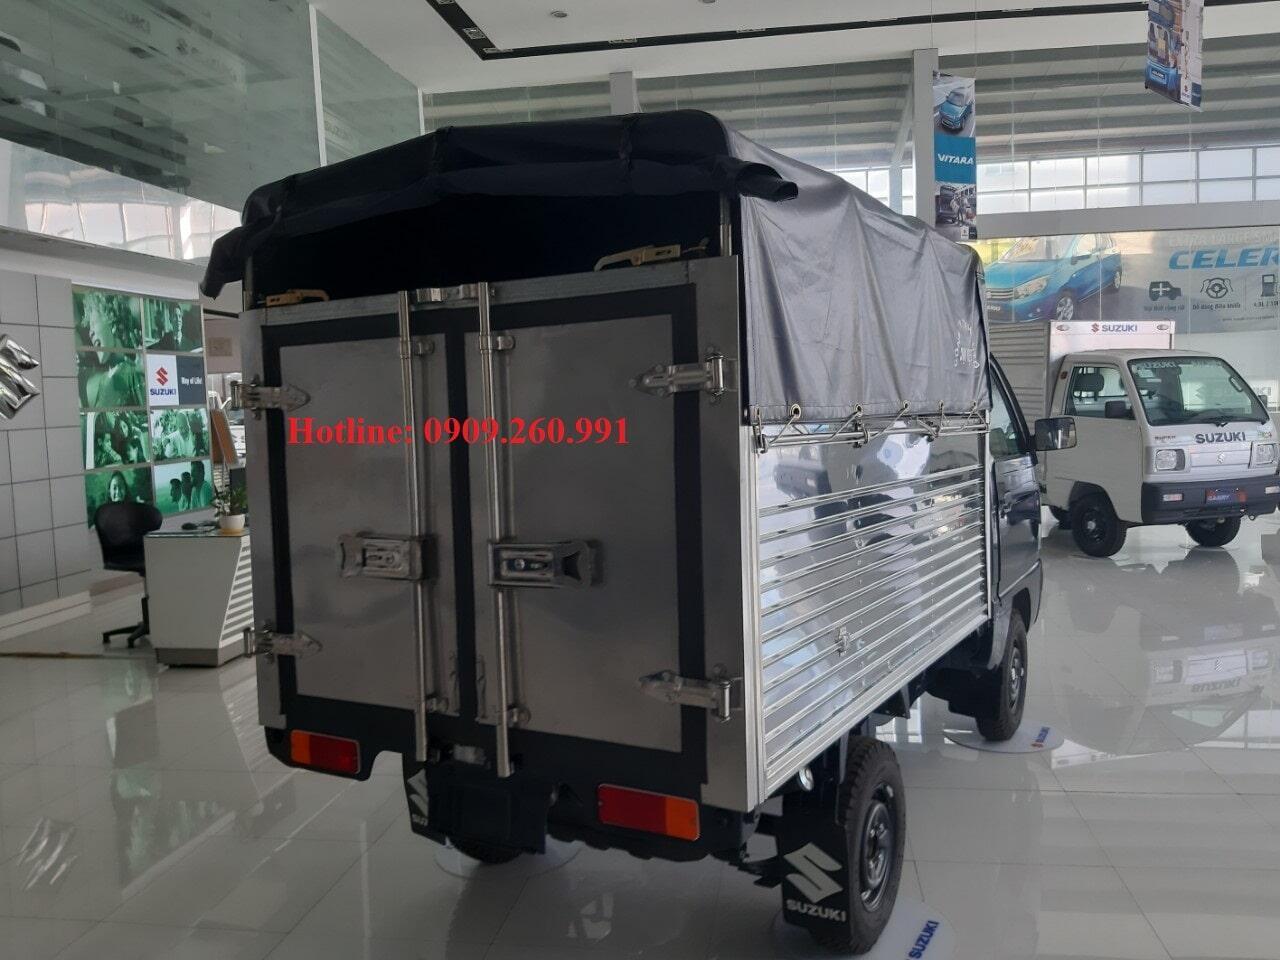 Suzuki Carry Truck mui bạt - Xe tải nhẹ Suzuki 550kg